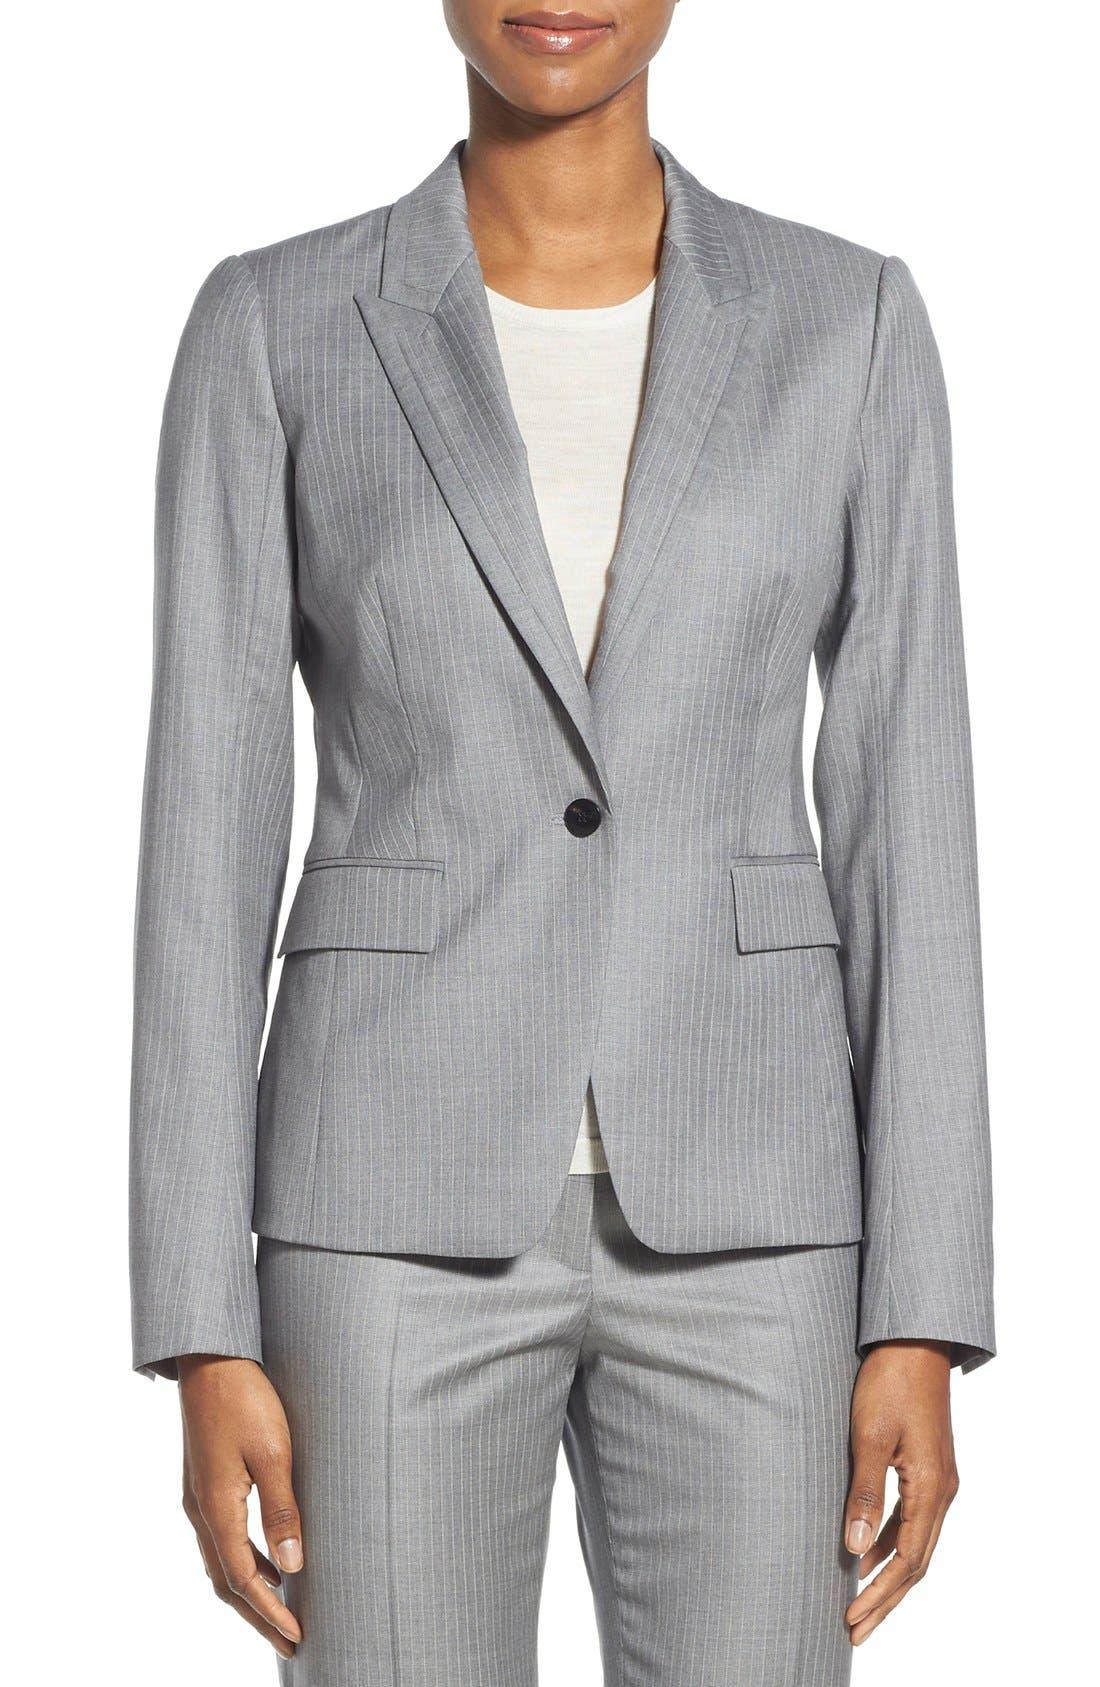 'Jelenna' Pinstripe One-Button Suit Jacket,                             Main thumbnail 1, color,                             060